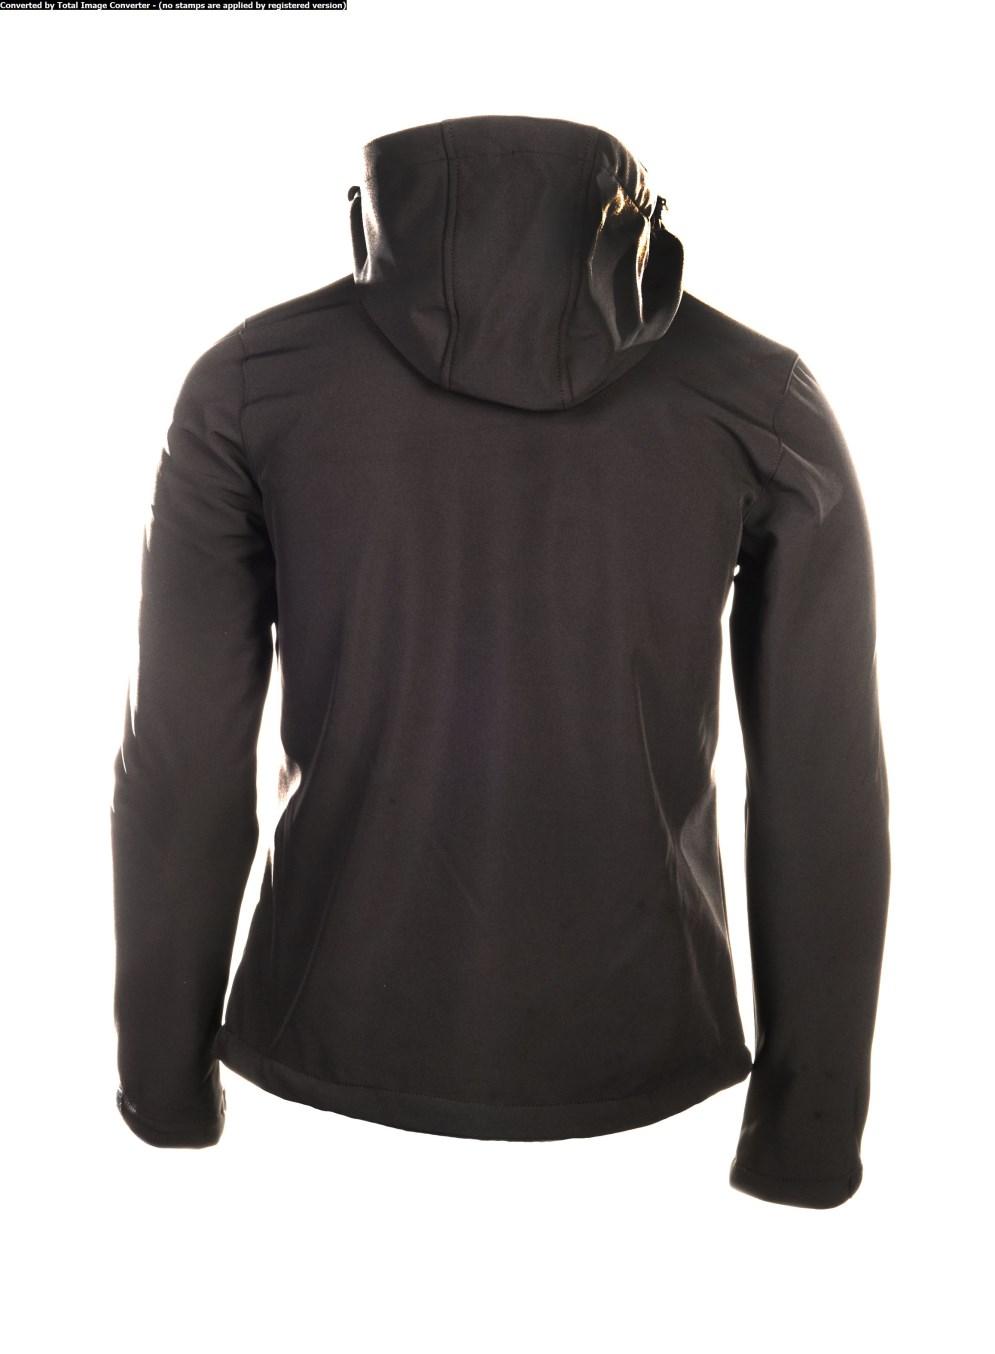 herren softshell spitsbergen sportjacke softshell ski jacke jacket black hooded ebay. Black Bedroom Furniture Sets. Home Design Ideas